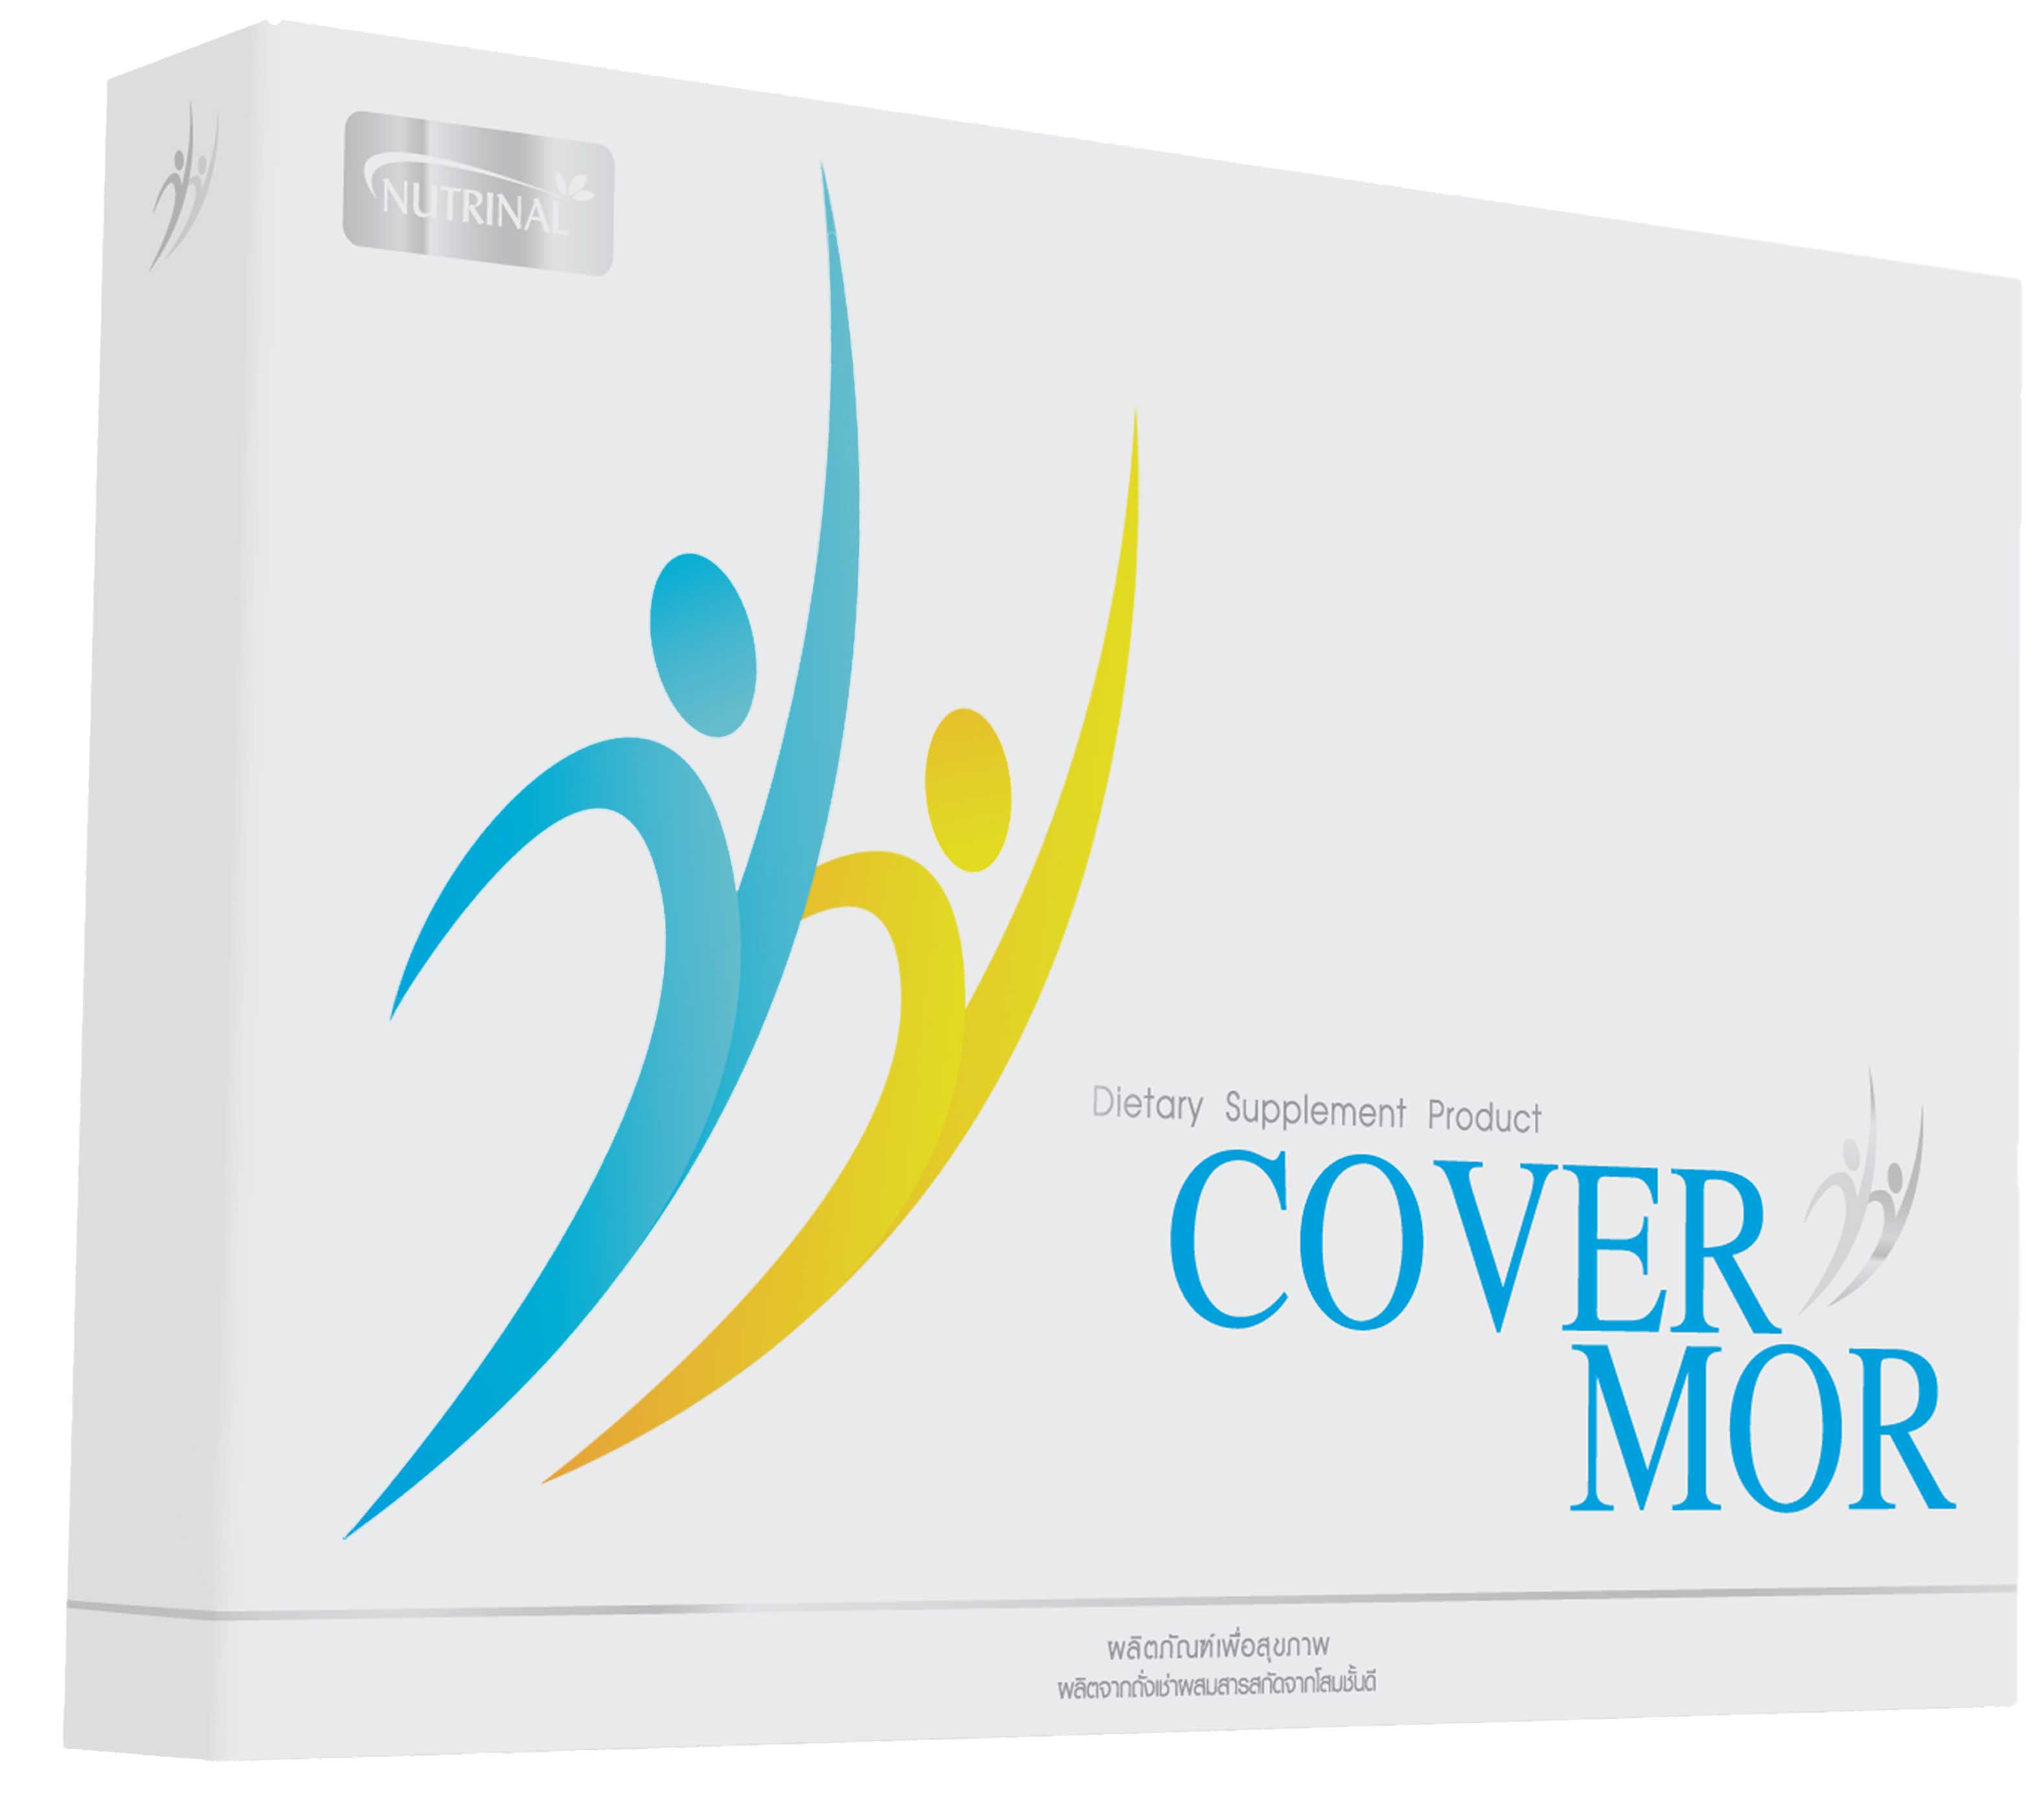 Cover More สุดยอดราชาแห่งสมุนไพร ถั่งเช่าผสมสารสกัดจากโสม เสริมพลังภูมิคุ้มกันร่างกาย เพื่อสุขภาพที่ดี